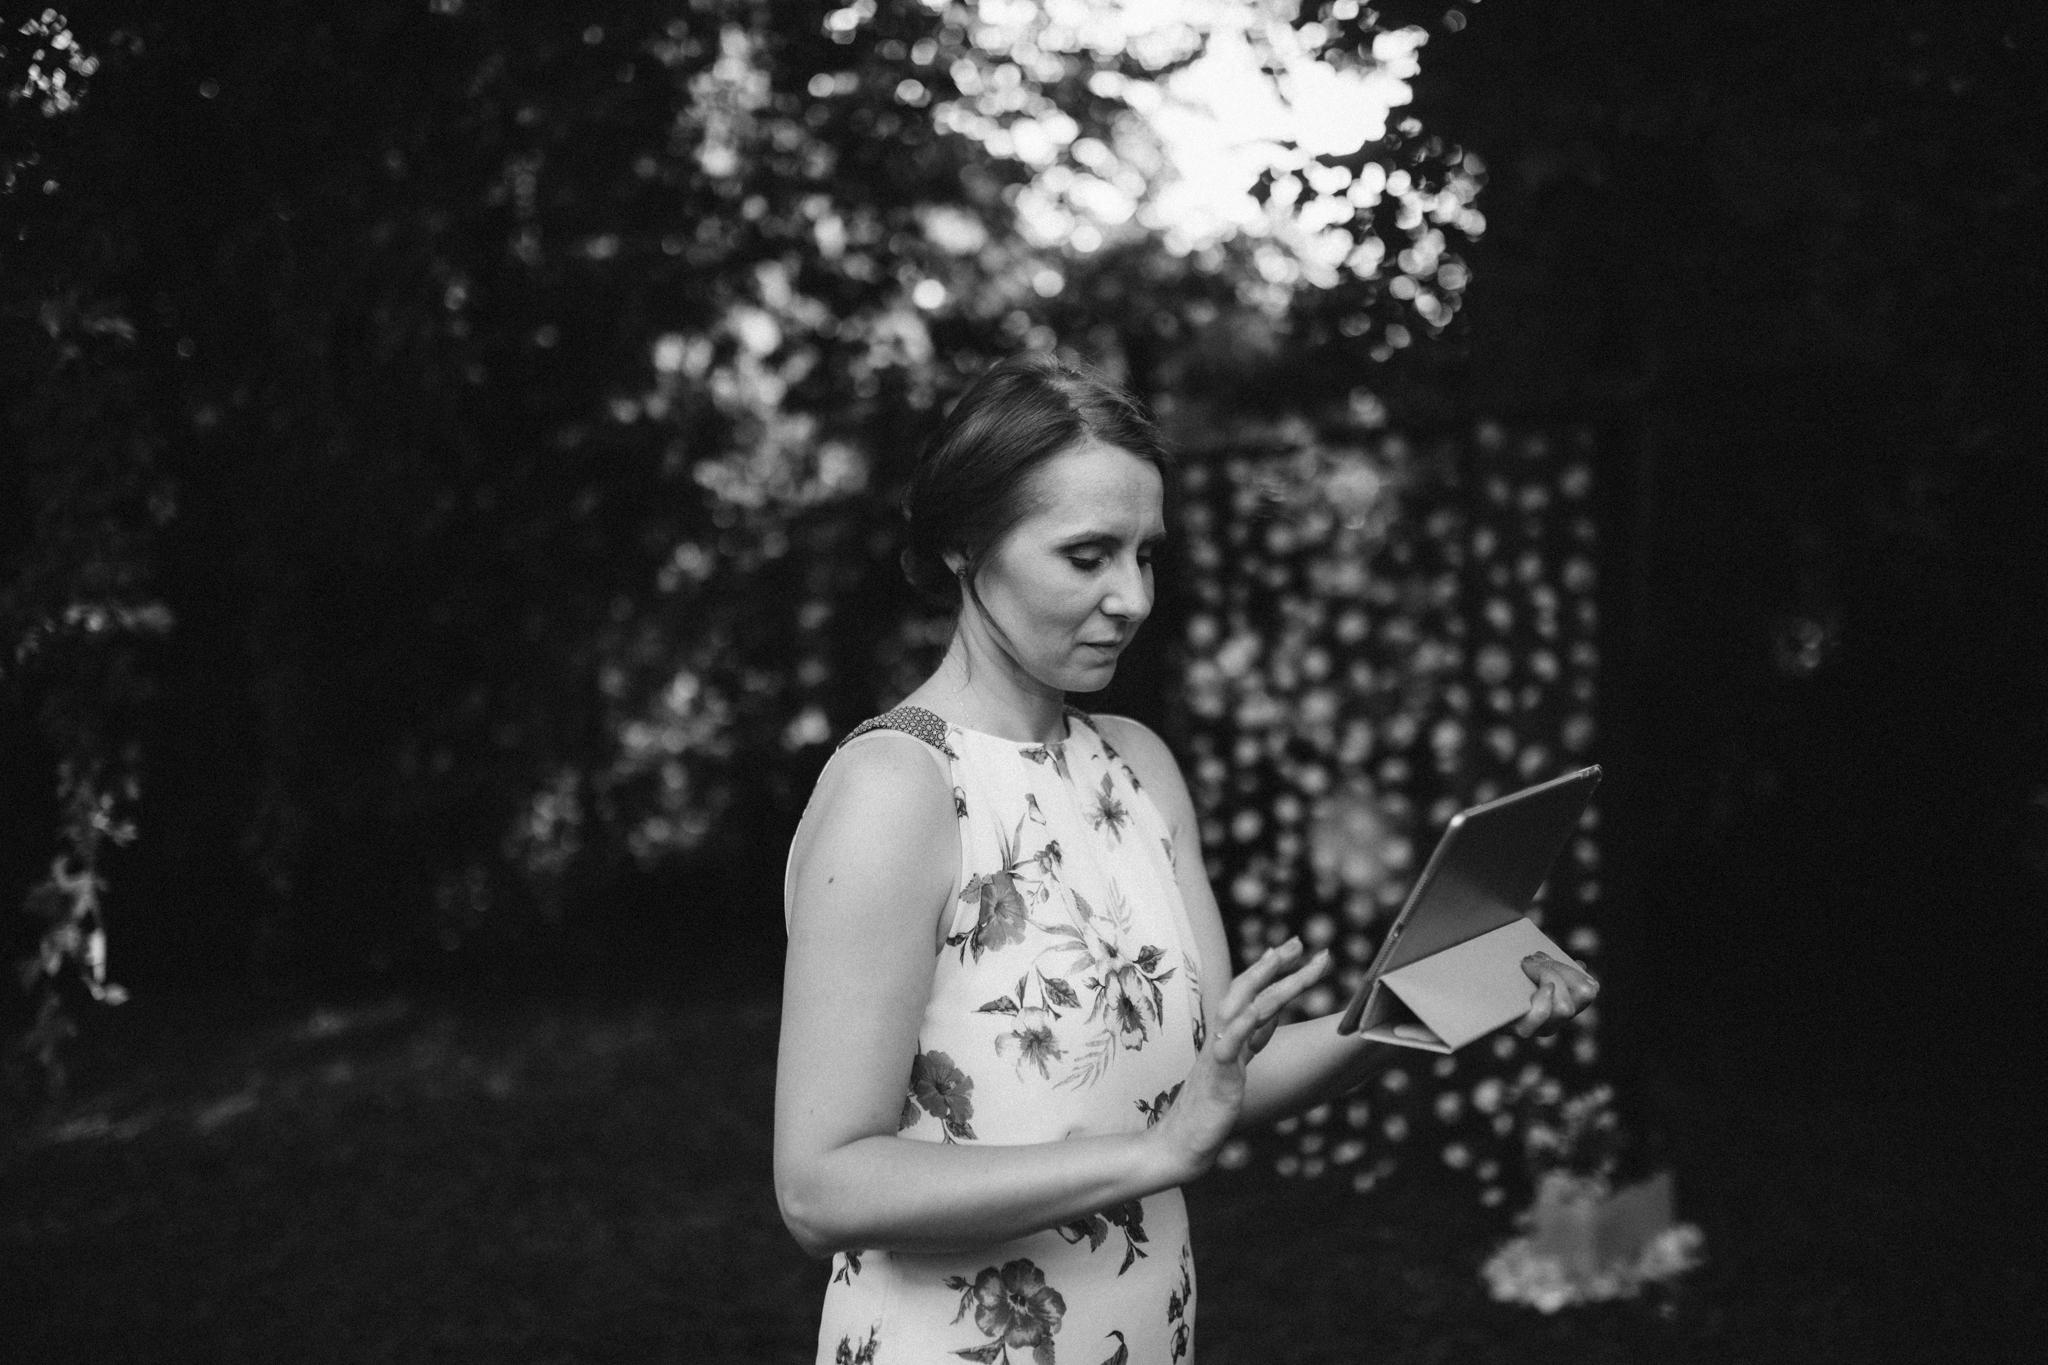 dorota_dwight_richmond_backyard_wedding-49.jpg